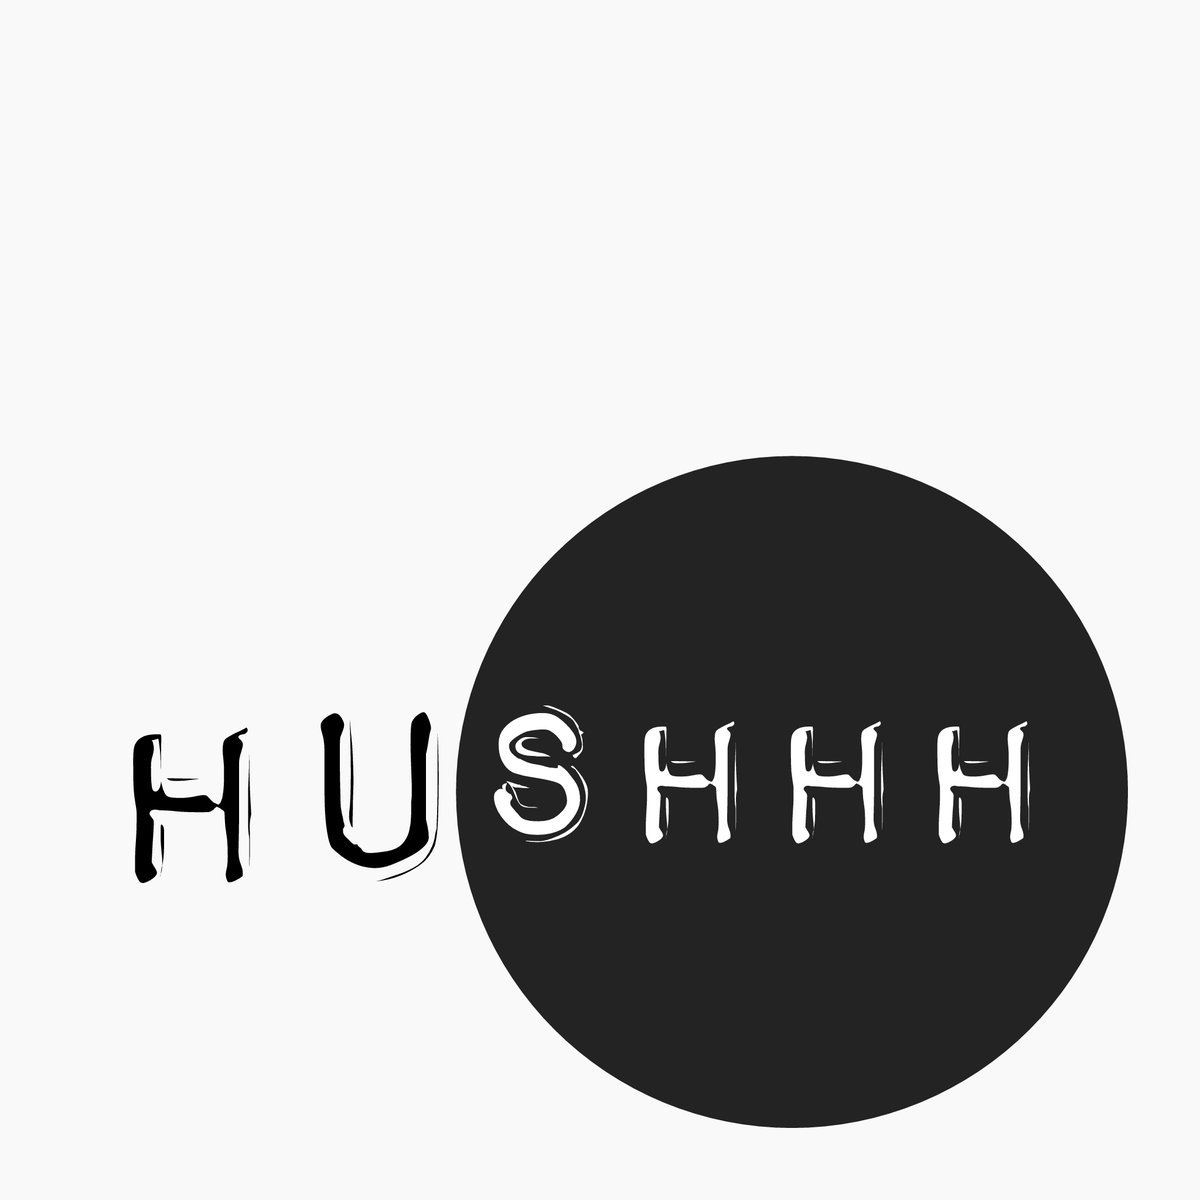 hushhh